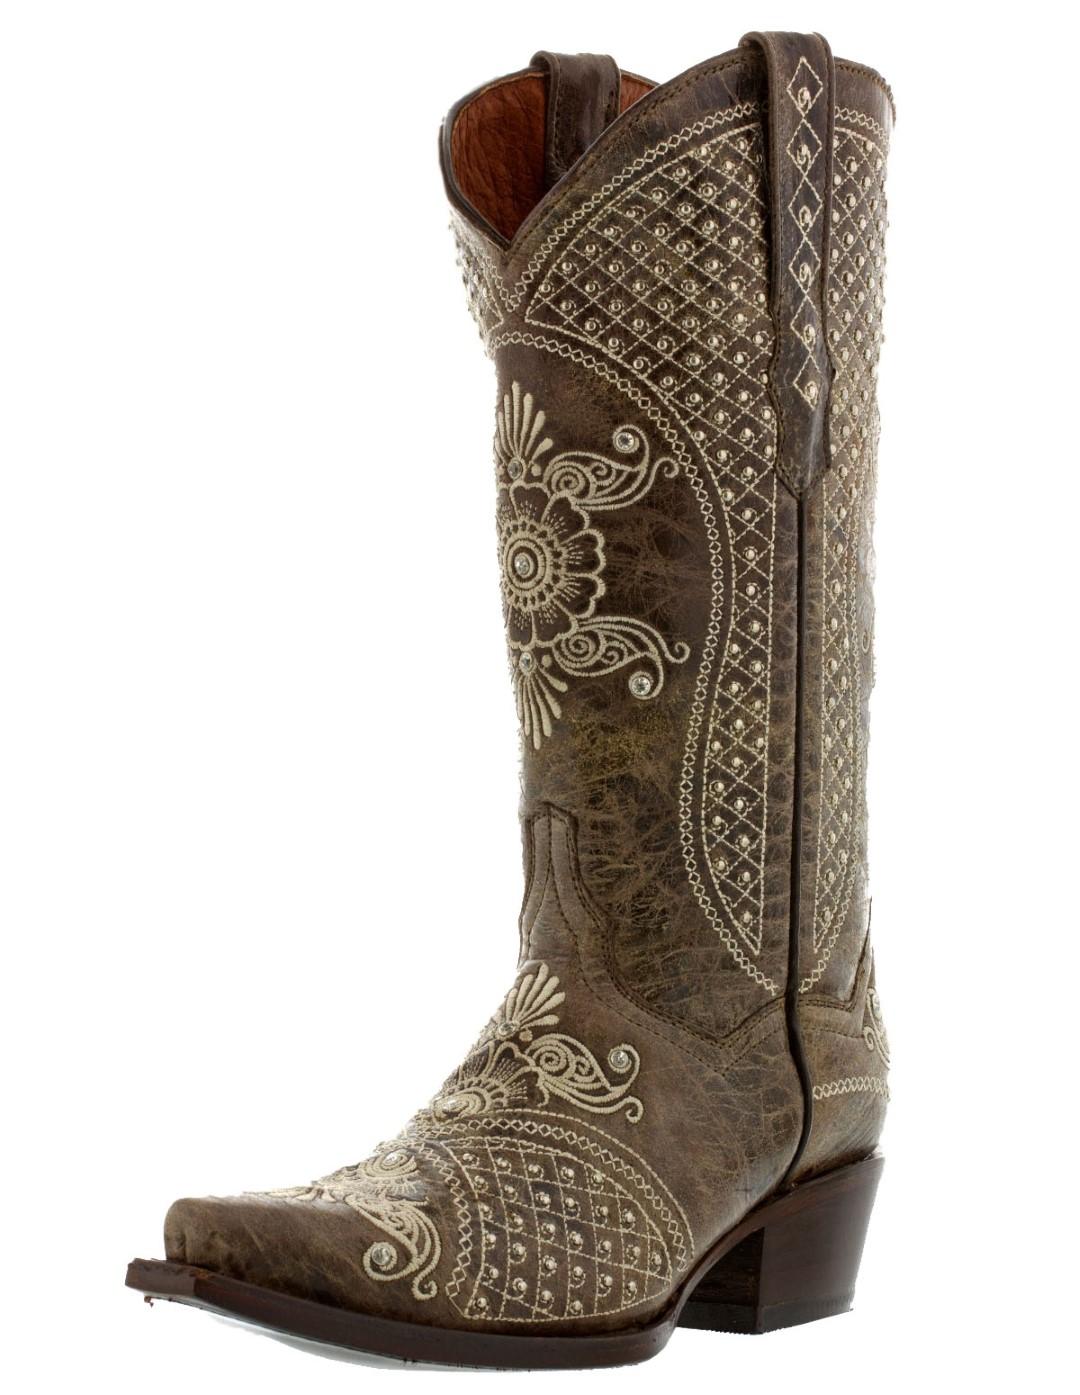 Womens Distressed Brown Wedding Leather Cowboy Boots Studded Rhinestones Western  eBay